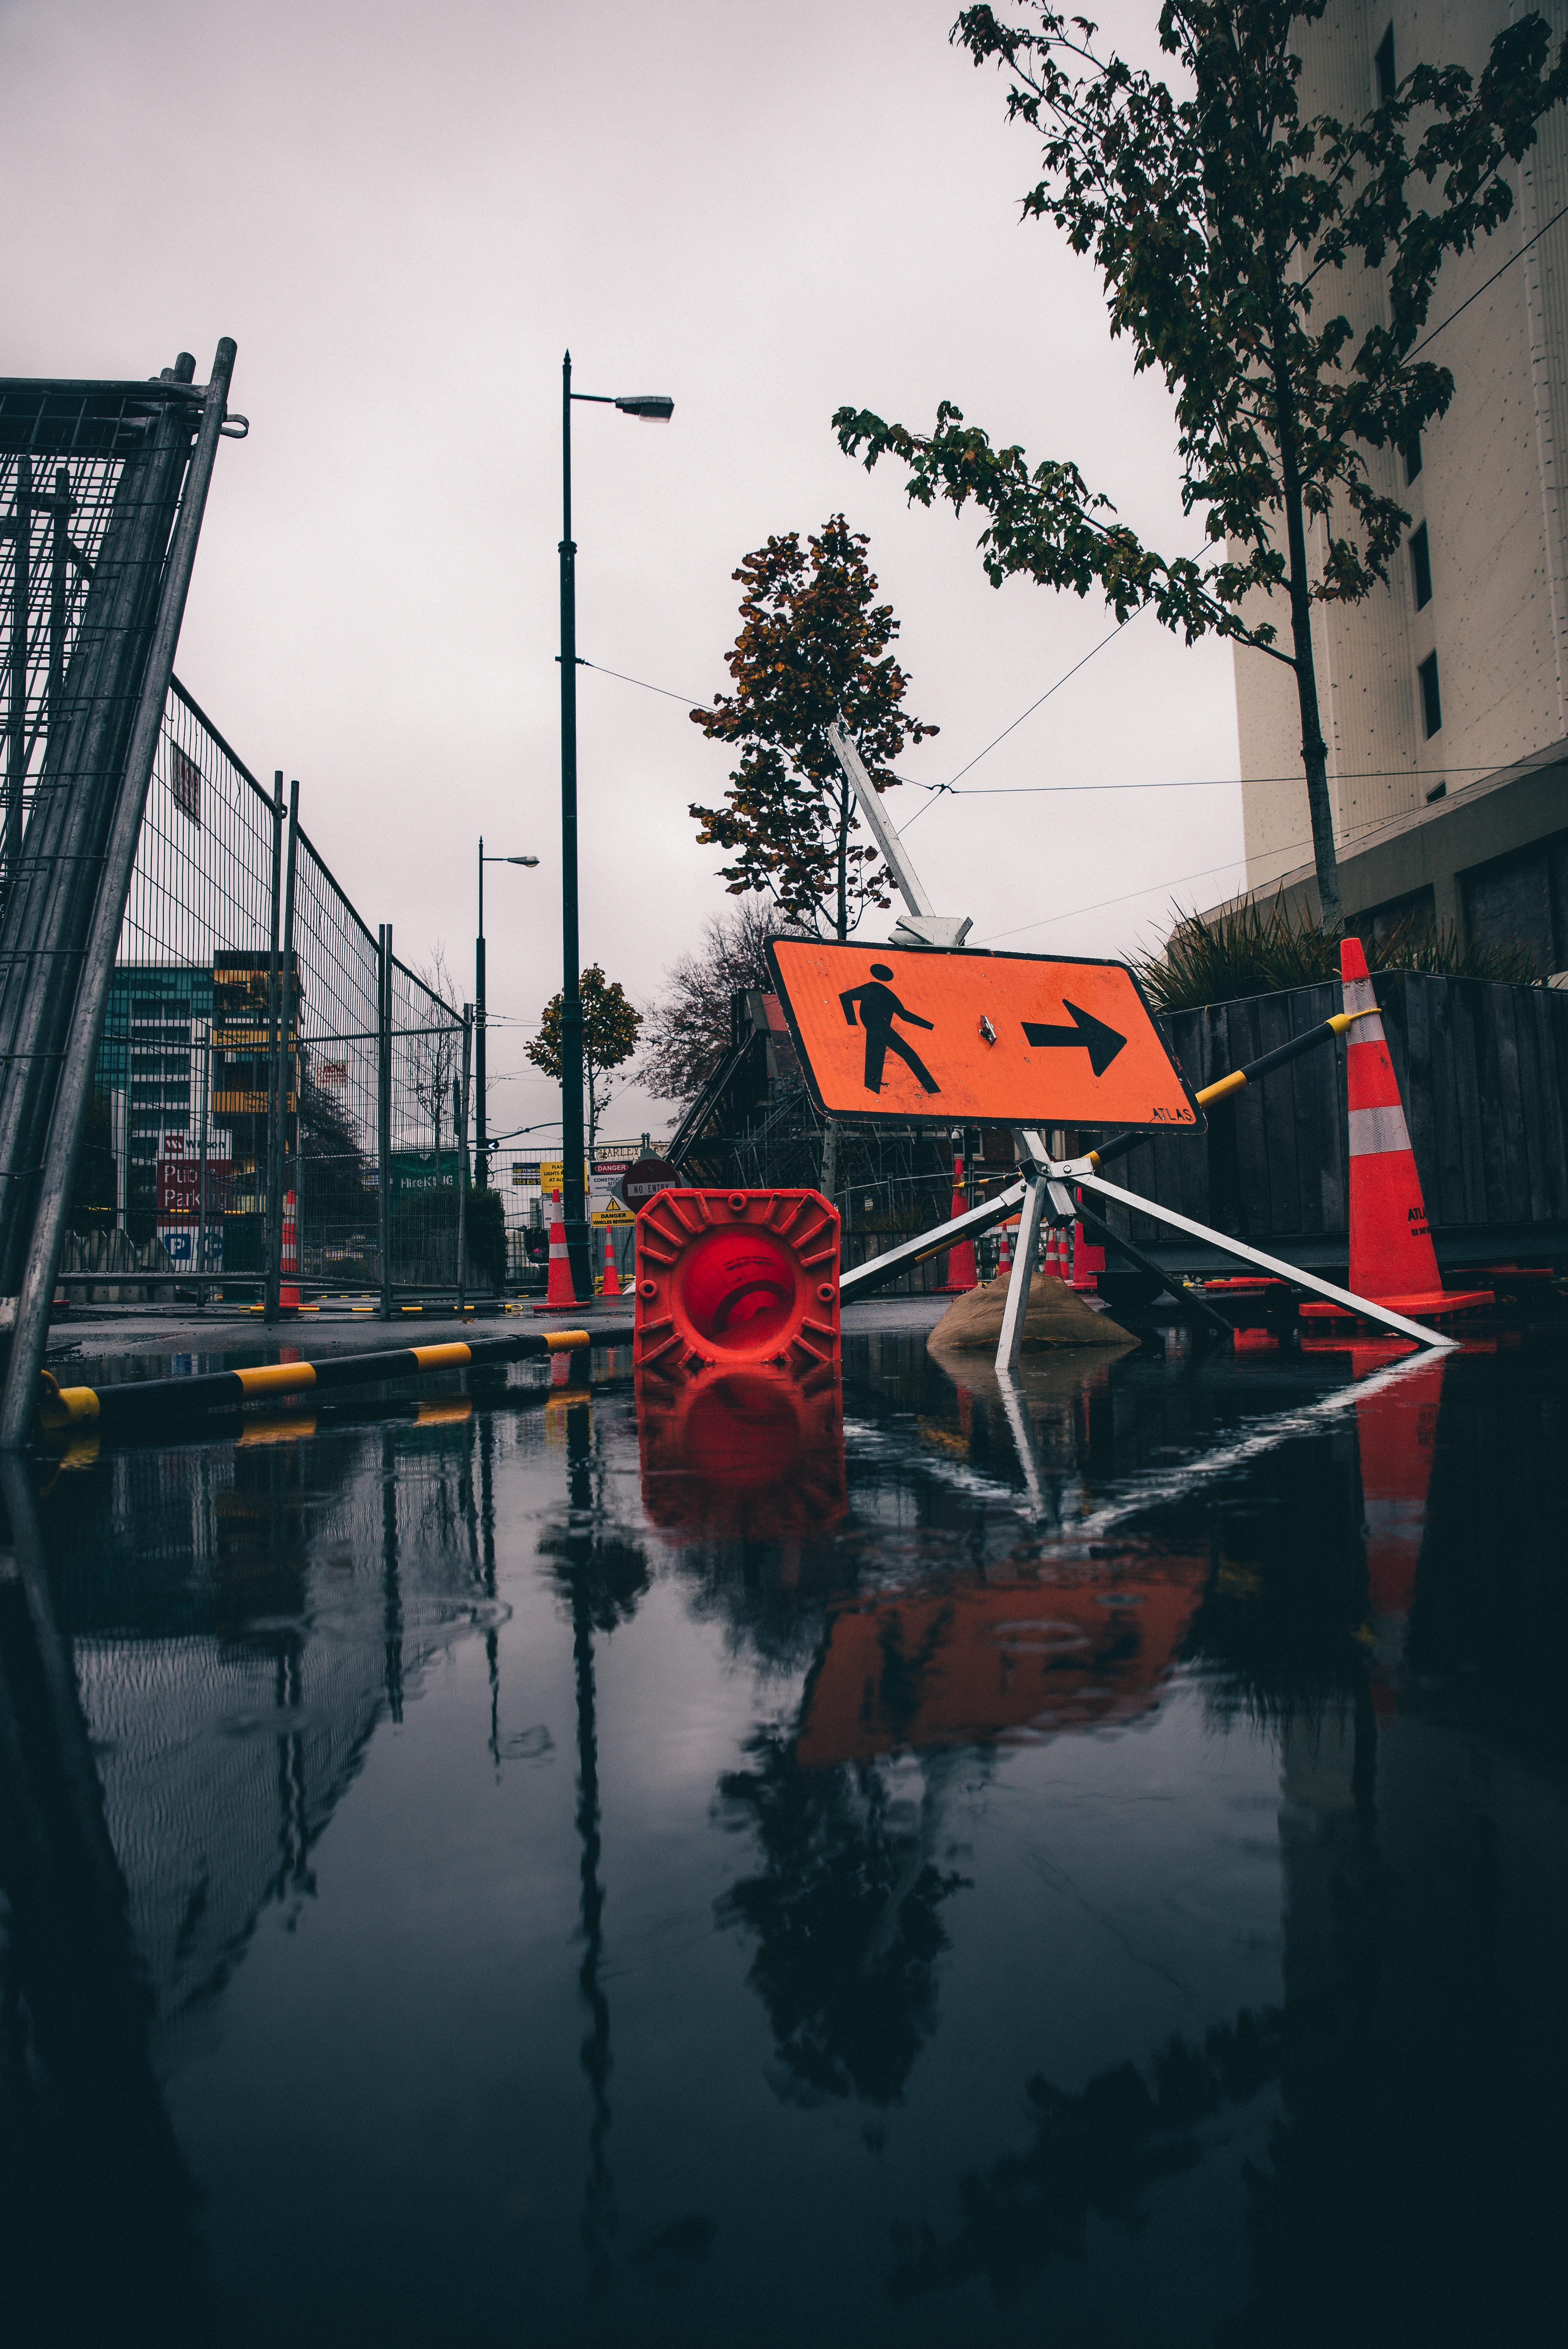 orange and white traffic cone near light post during daytime